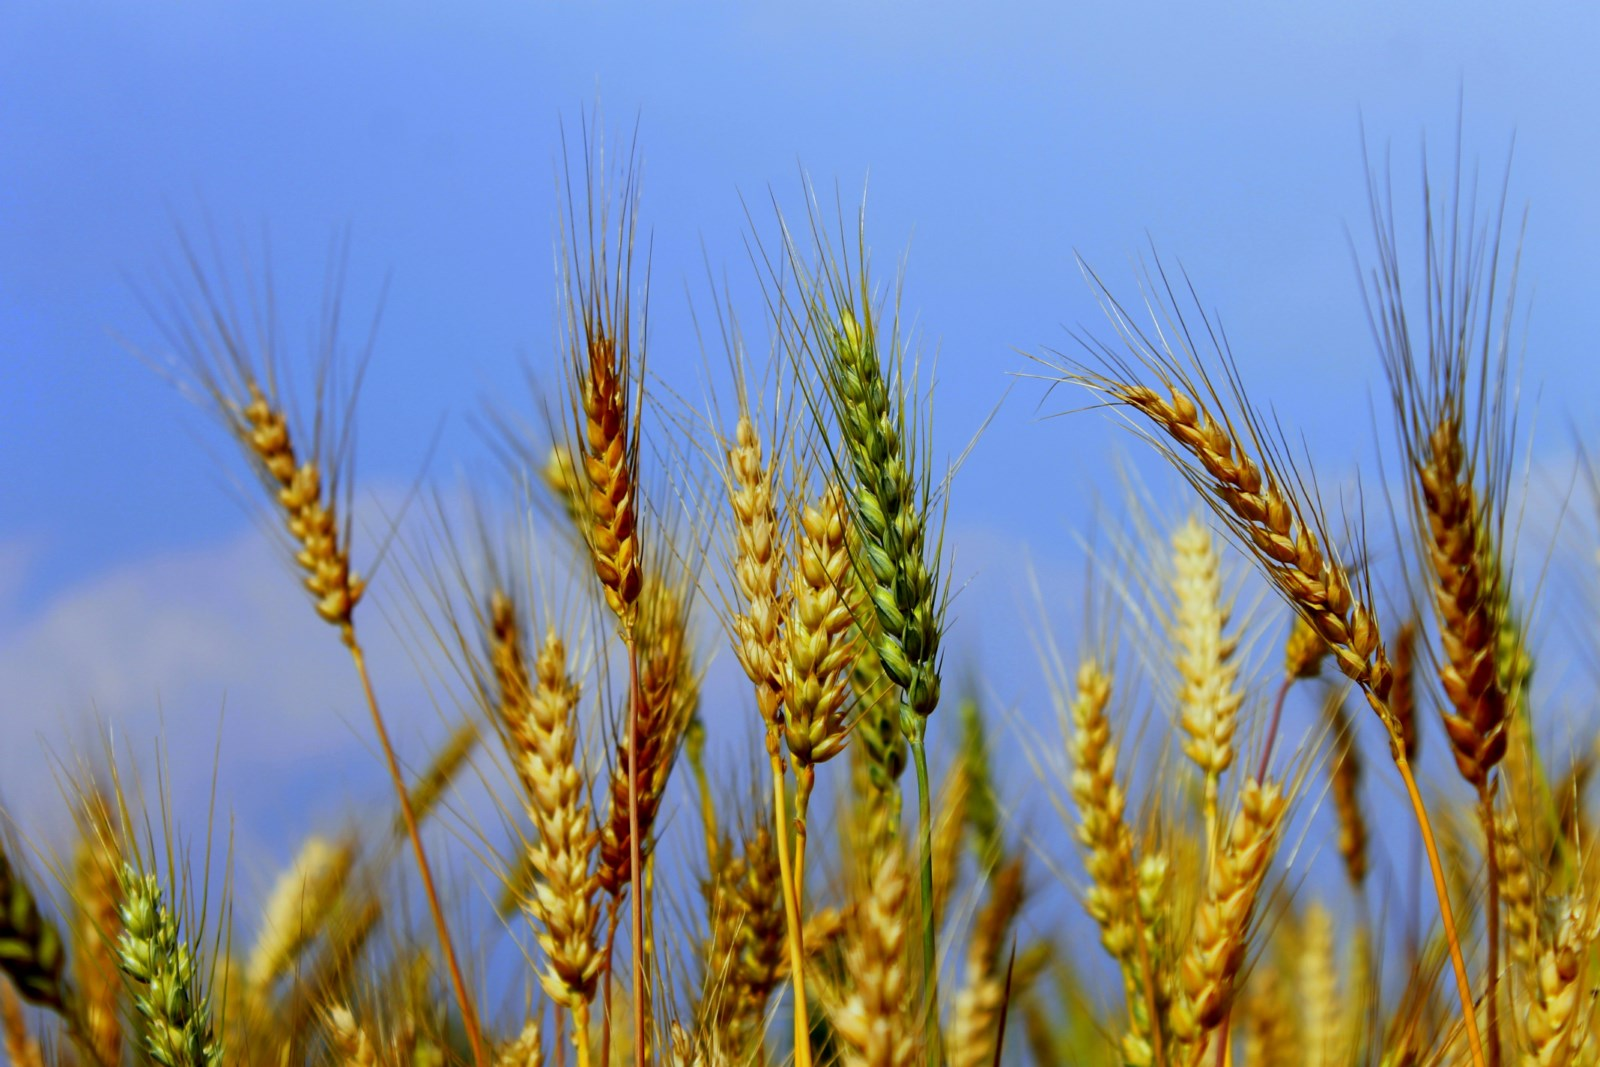 Wheat And Rice Cake